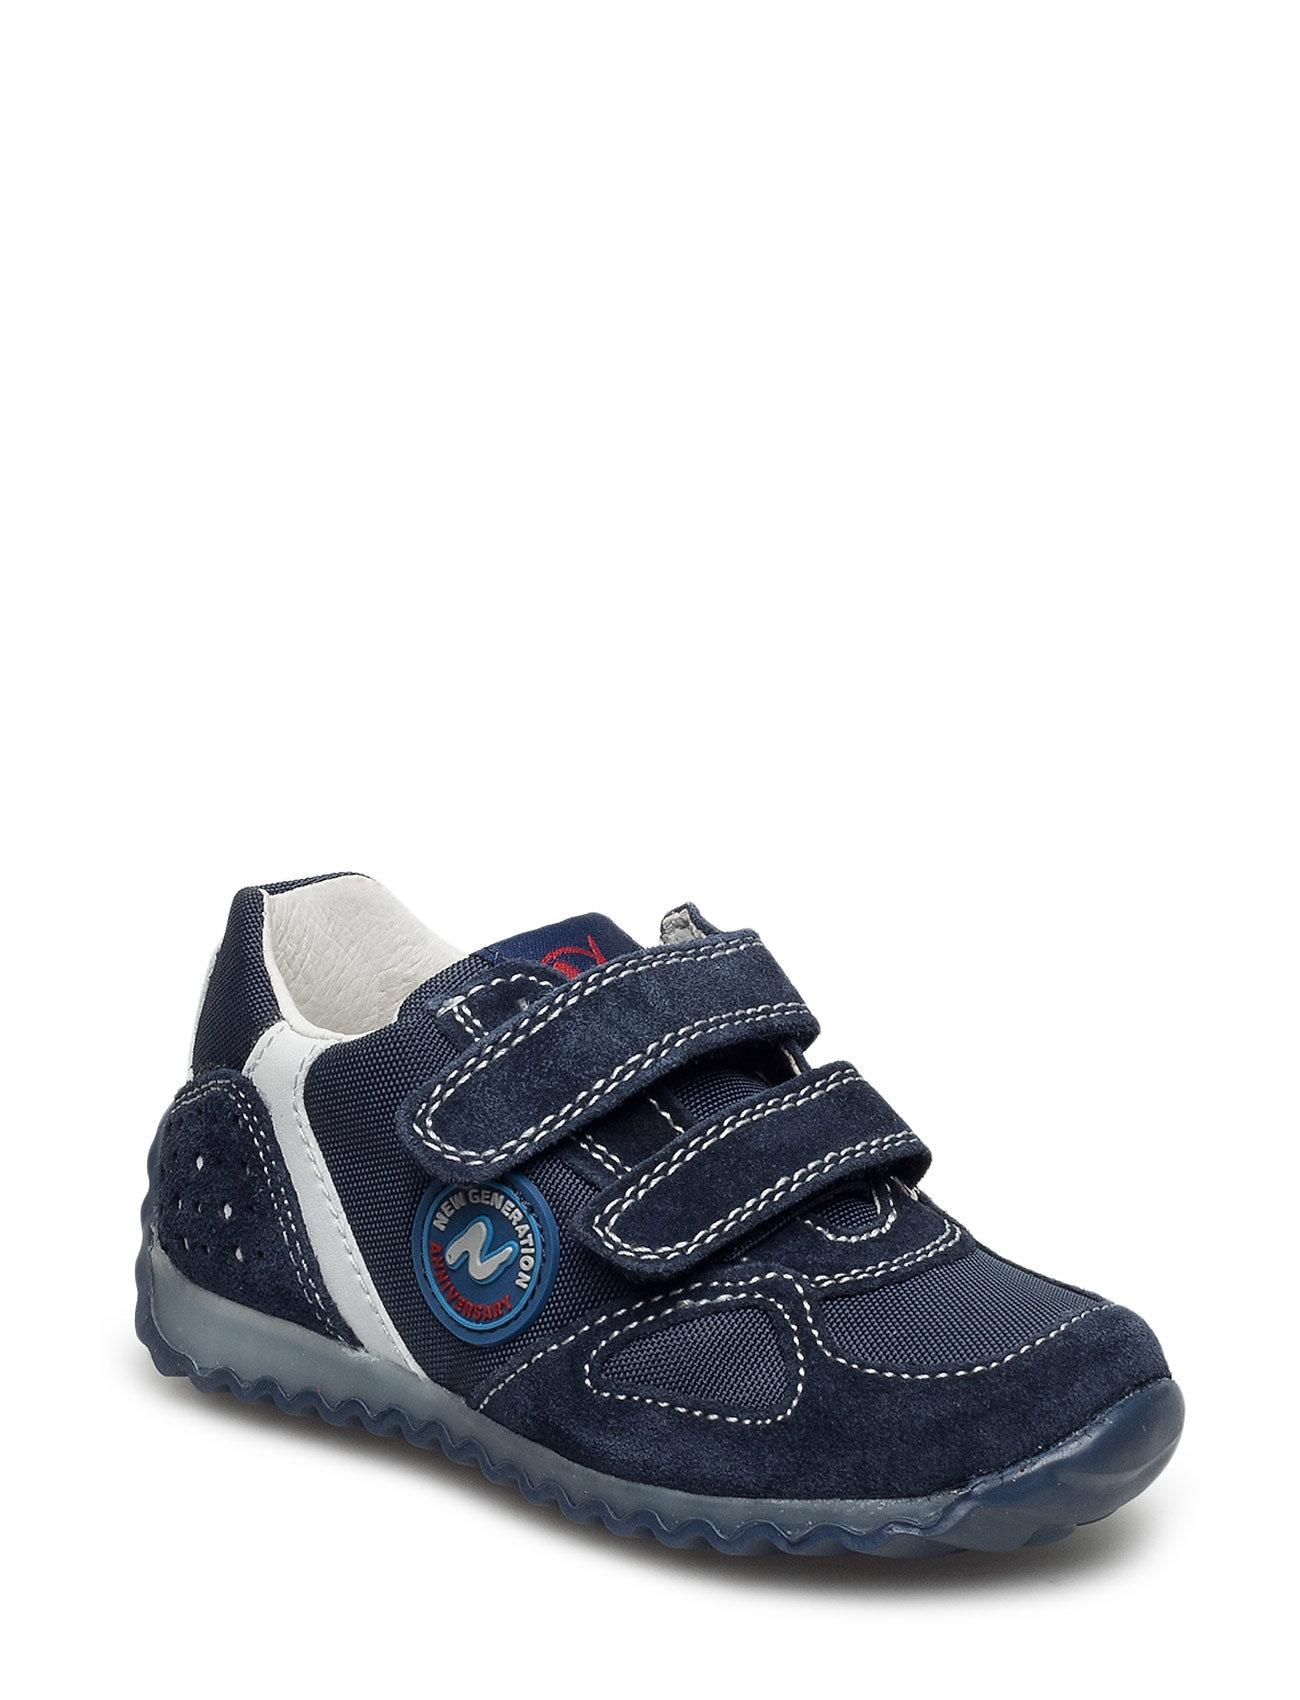 a34244b3e988 Naturino Isao Vl. Naturino Sko   Sneakers til Børn i Blå